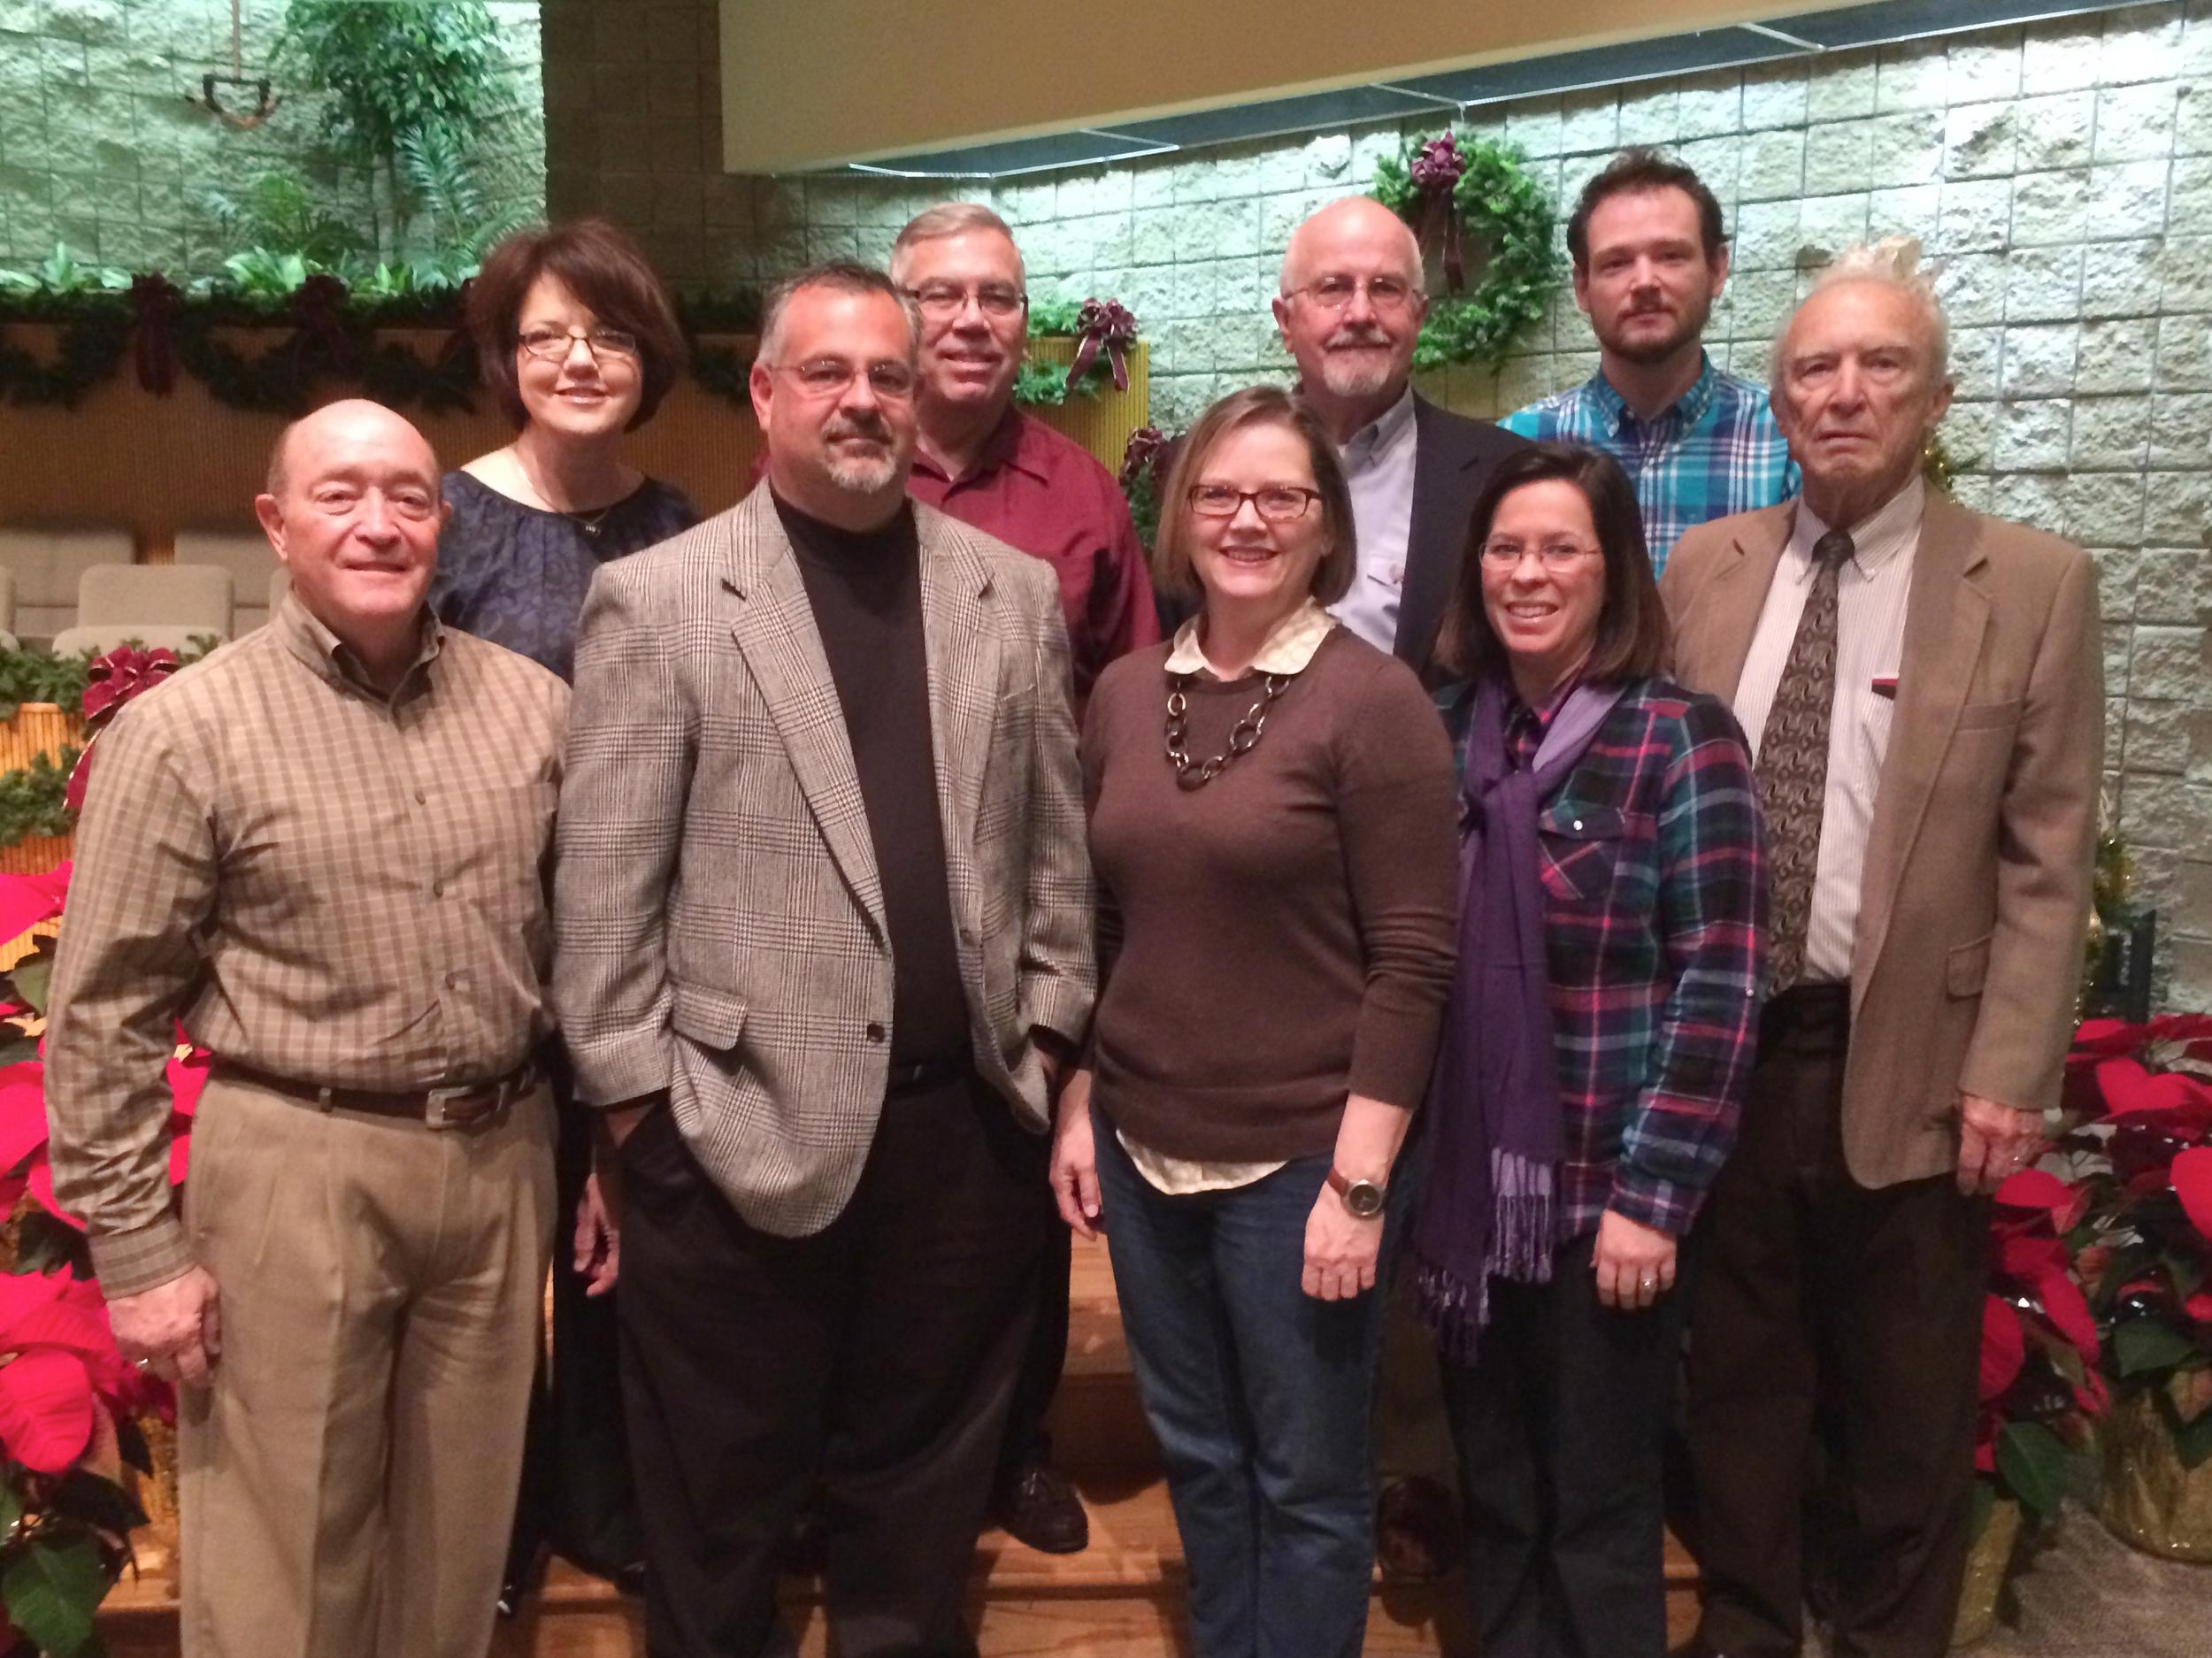 (Back Row): Ann Dunagin, Stan Barton, Jerry Sparks, Joey Pyle (Front Row): Jerry Bowerman, Monty Klepper, Shryln Treadwell, Beth Humphries, Duane Jone (Not Pictured): Nelda Kirk